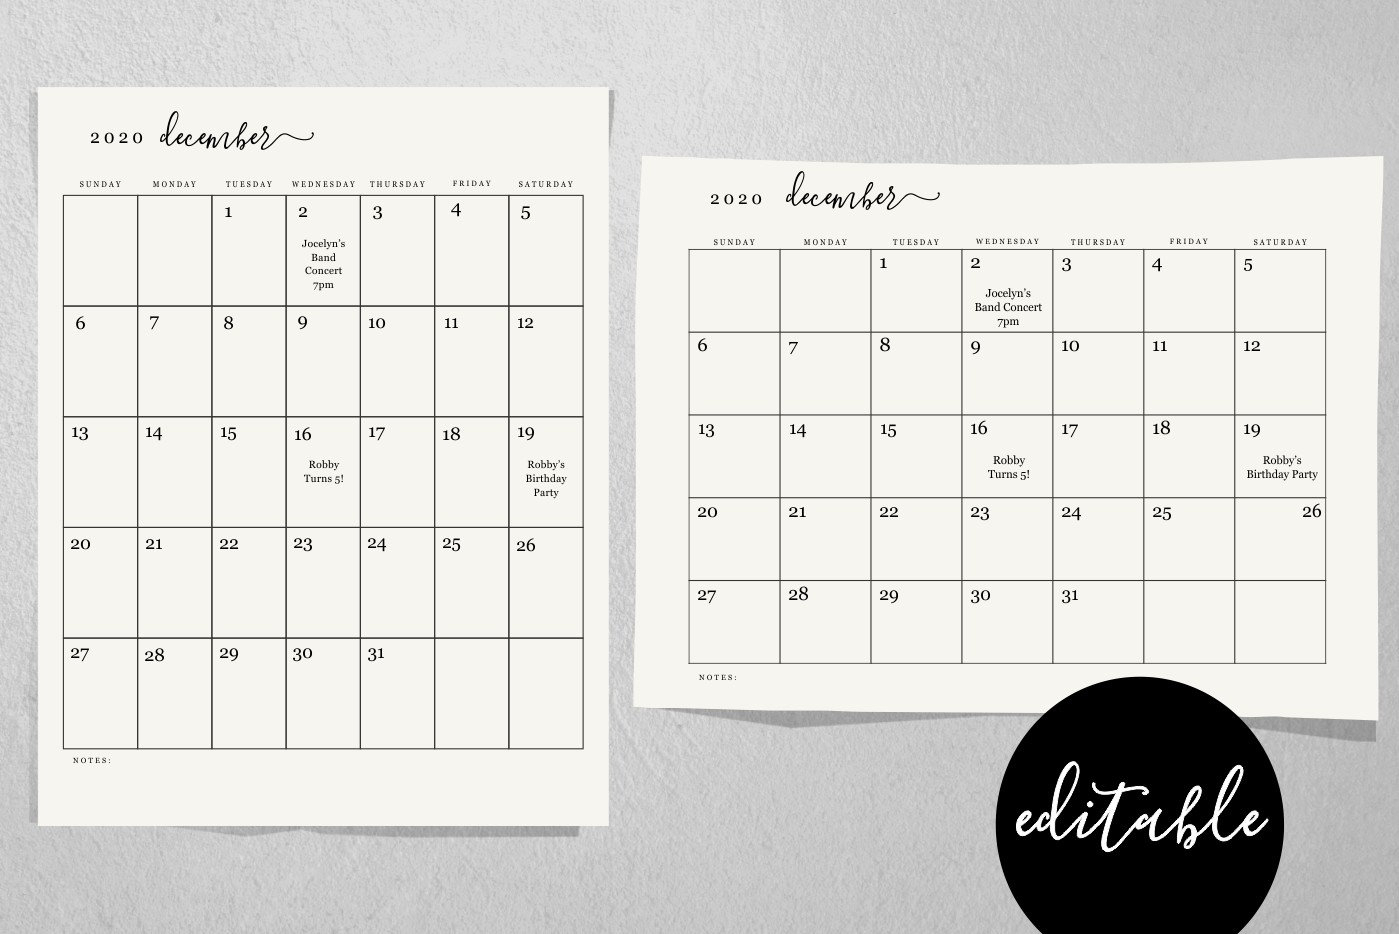 Editable Monthly Calendar Template - Printable 2019 And 2020 Desk Month  Calendar - Simple Black & White - Pdf Instant Download Digital File